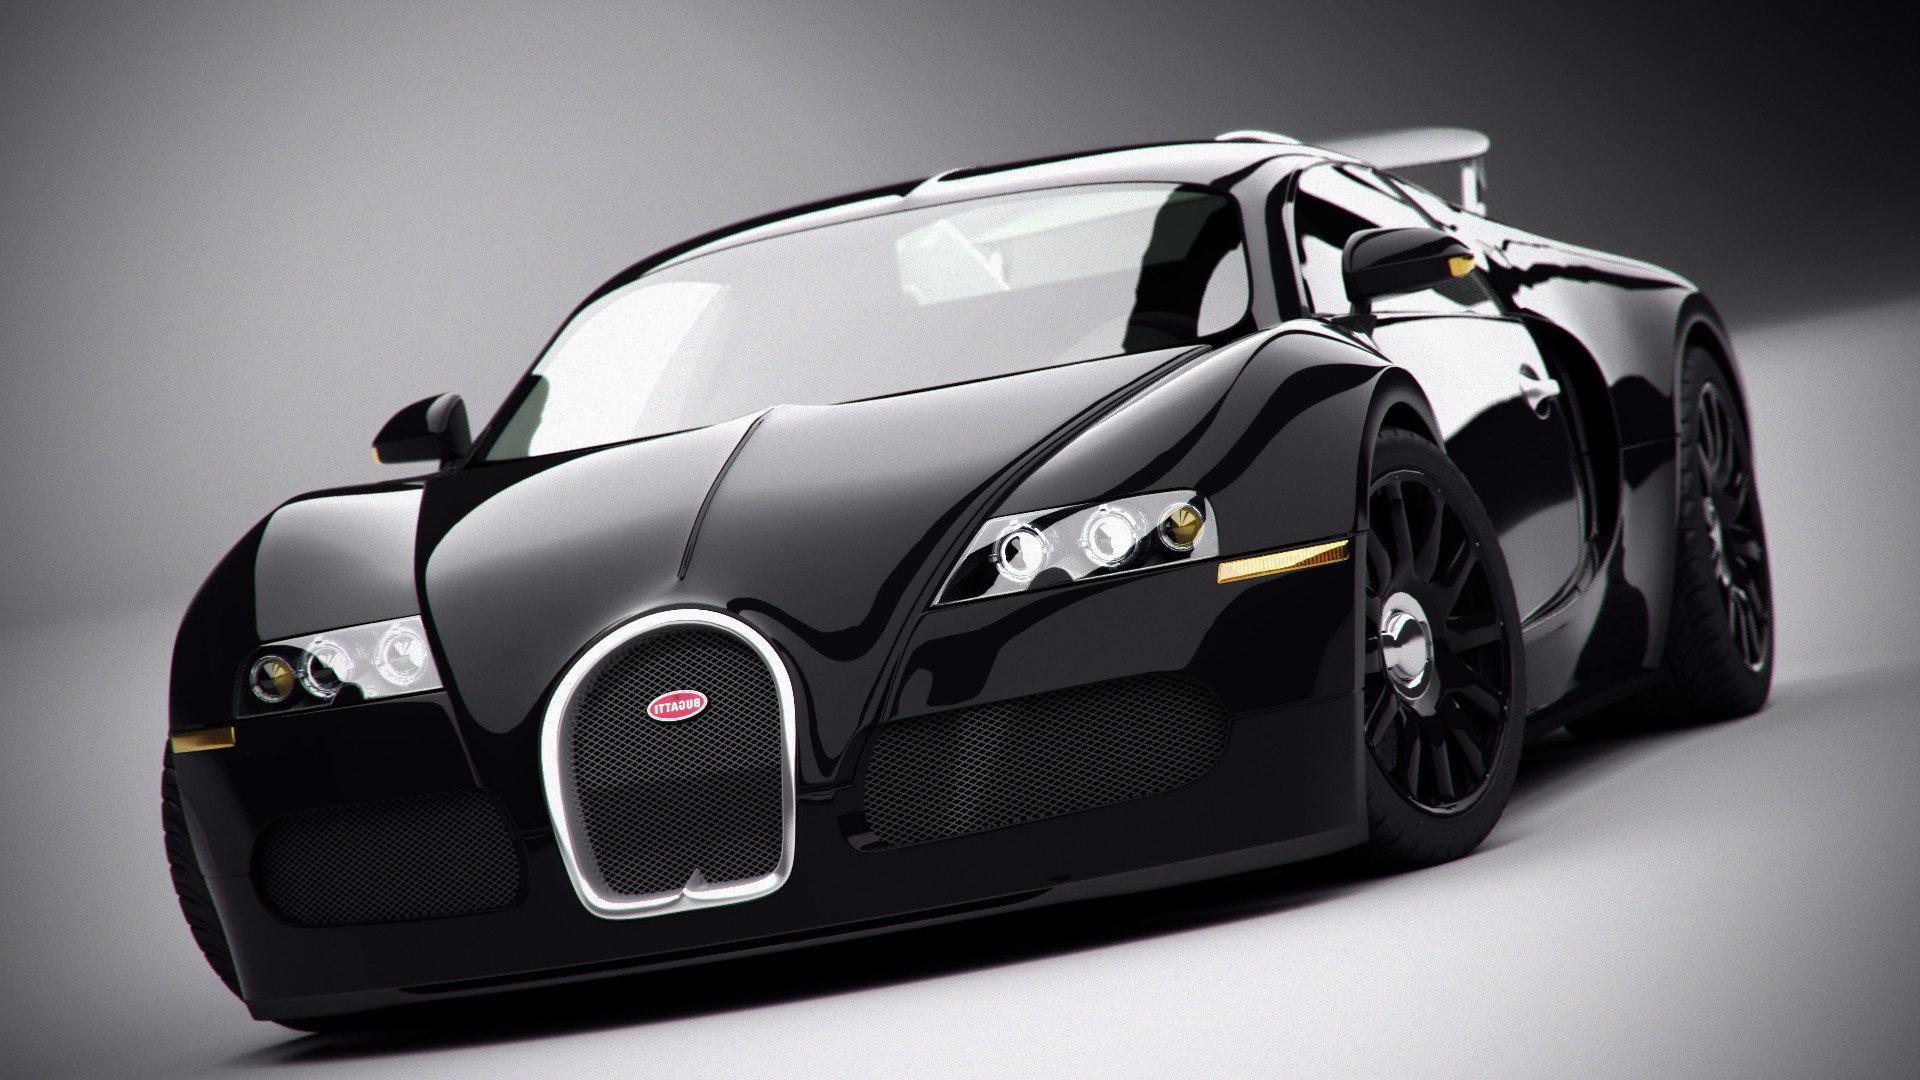 bugatti veyron wallpapers high quality download free - Bugatti Veyron Wallpaper